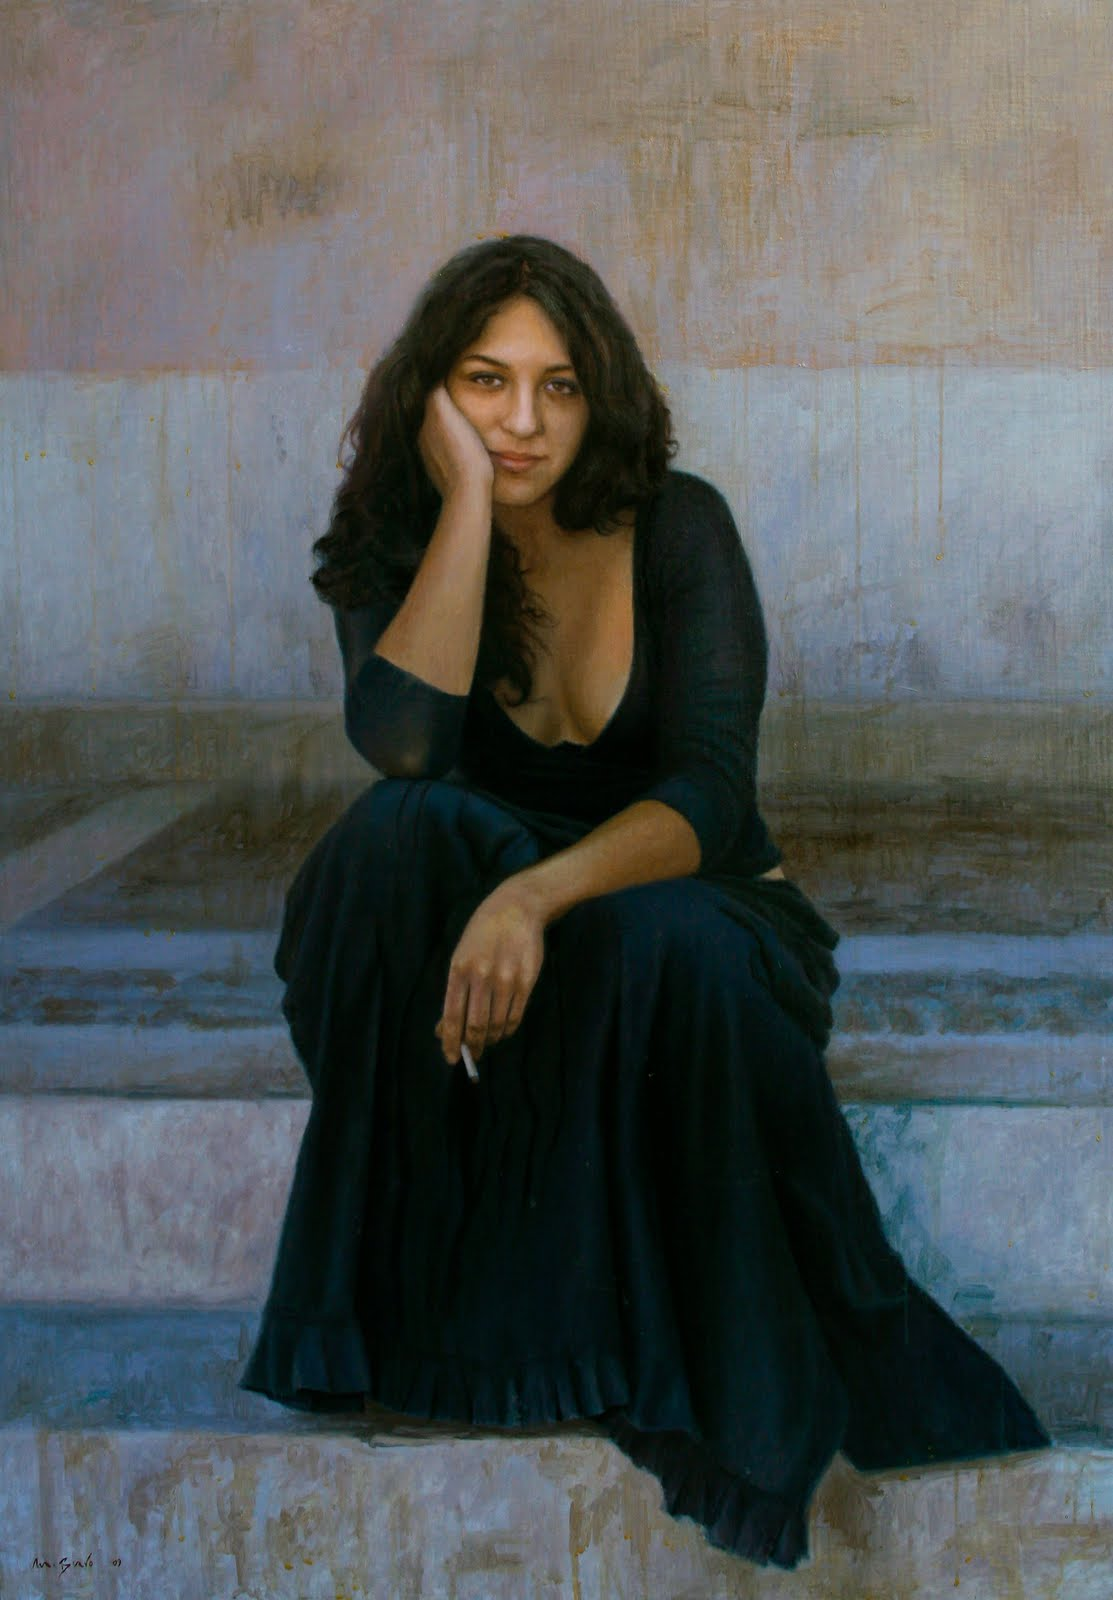 Nicole Arbour Hot images Charlotte Barker,Yuvika Chaudhary